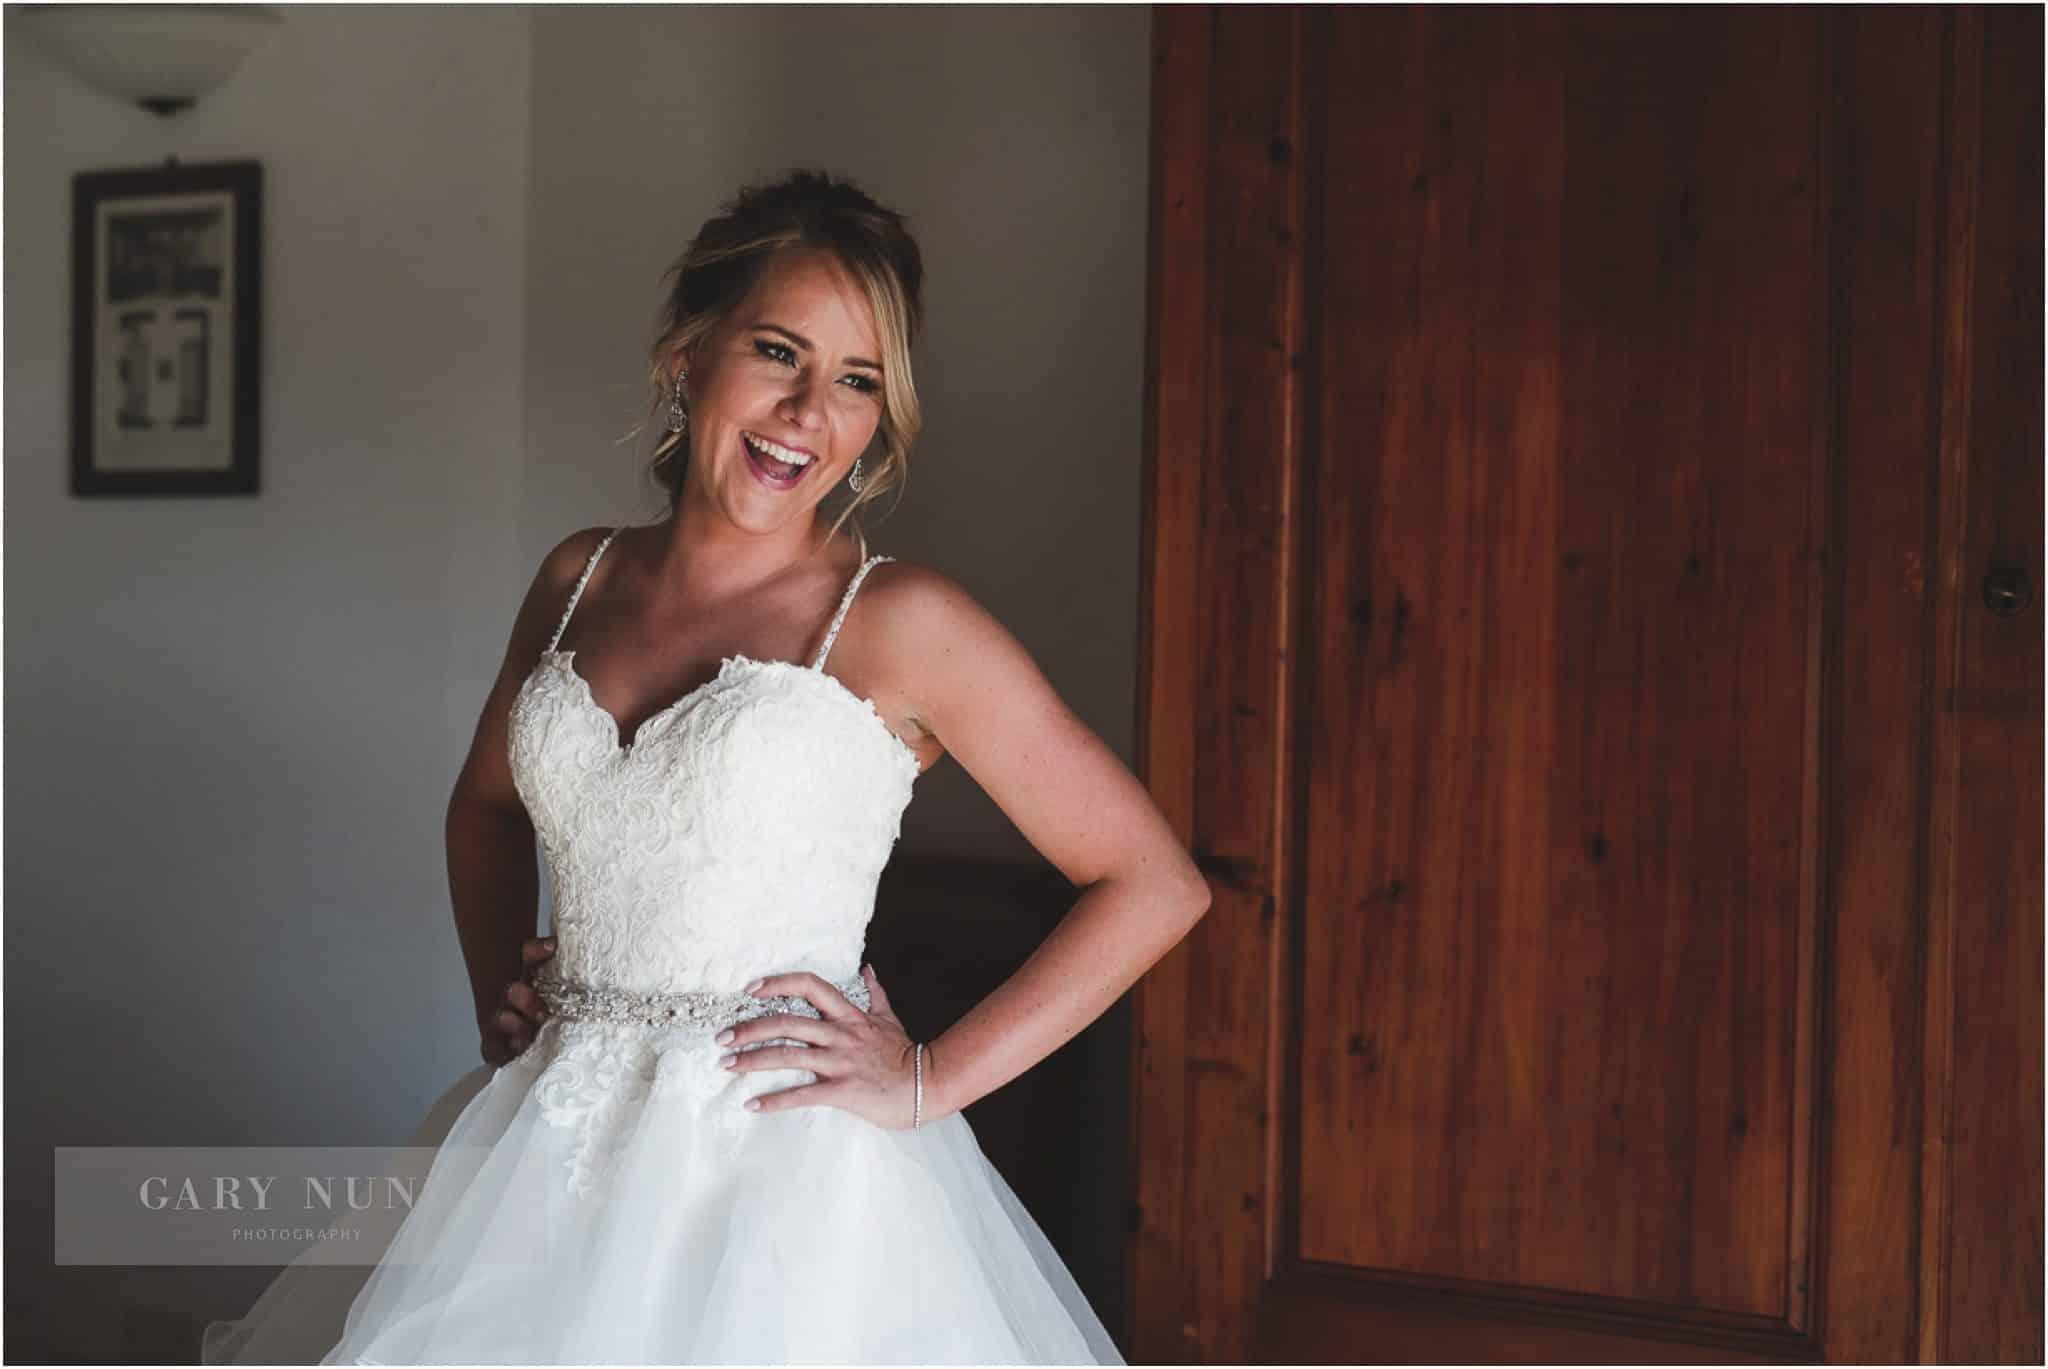 wedding photo checklist, bridal portrait, wedding checklist, wedding planning checklist, Destination Wedding Photographer